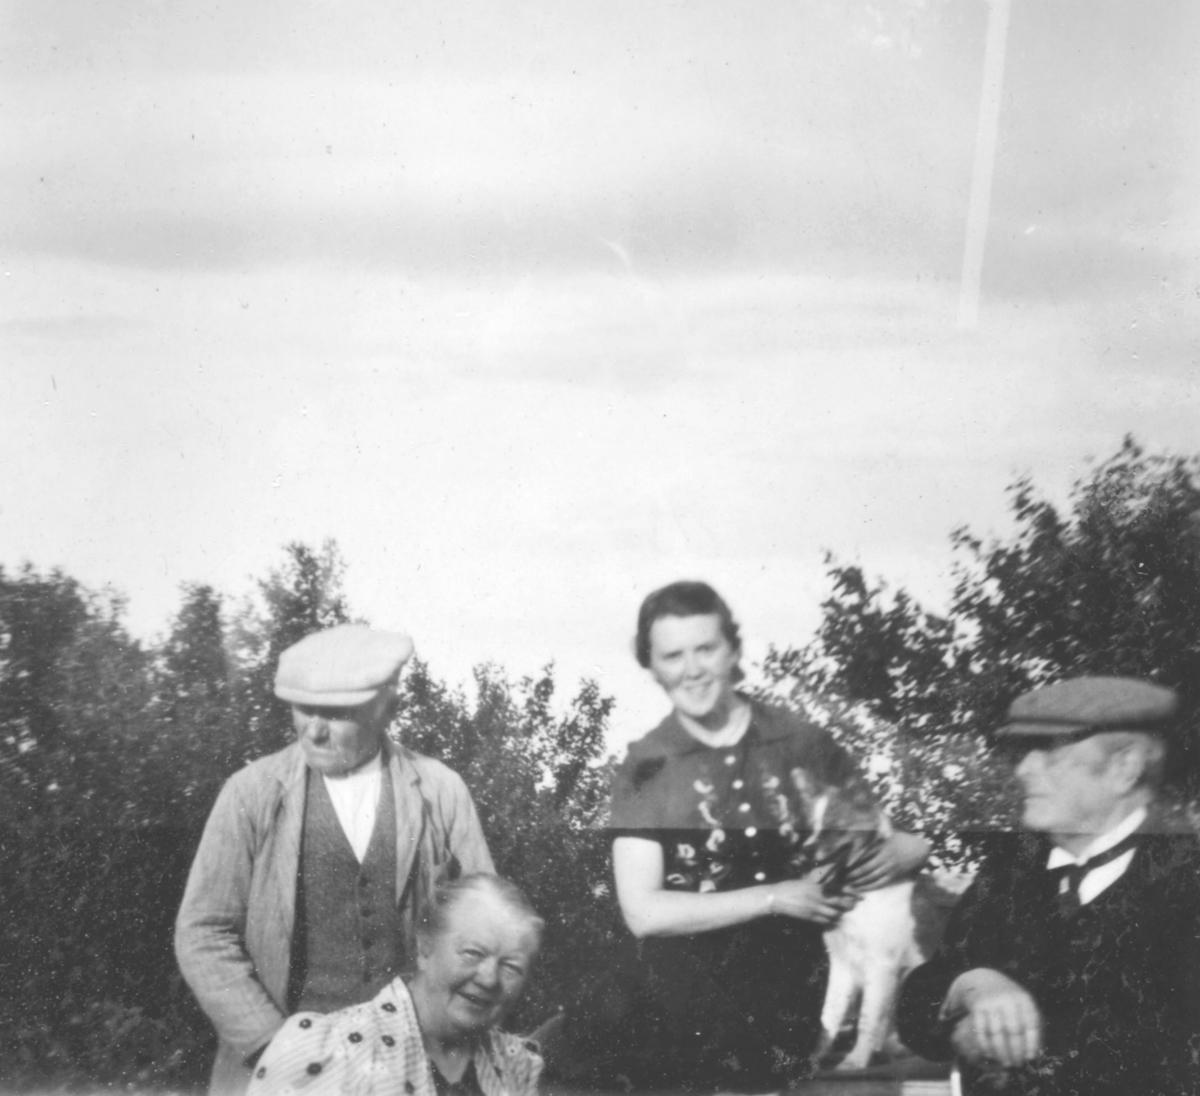 En dame står med en hund foran seg. Hunden ligger på en kasse eller lign. To menn på hver side og en dame til venstre foran. Antagelig Karoline Ohlsen. Bak er det trær.